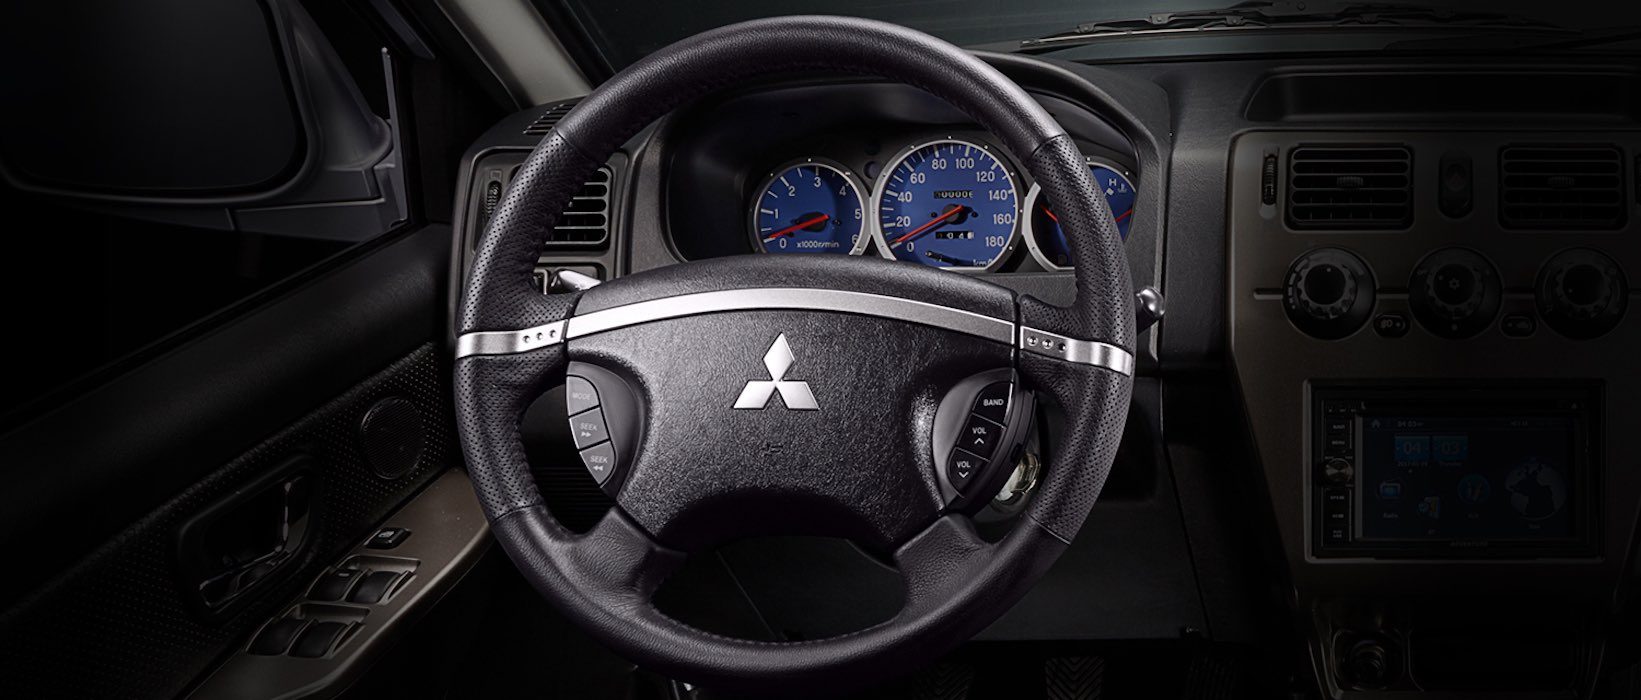 Mitsubishi Adventure's Dashboard and Wheel | Rent-A-Car Palawan